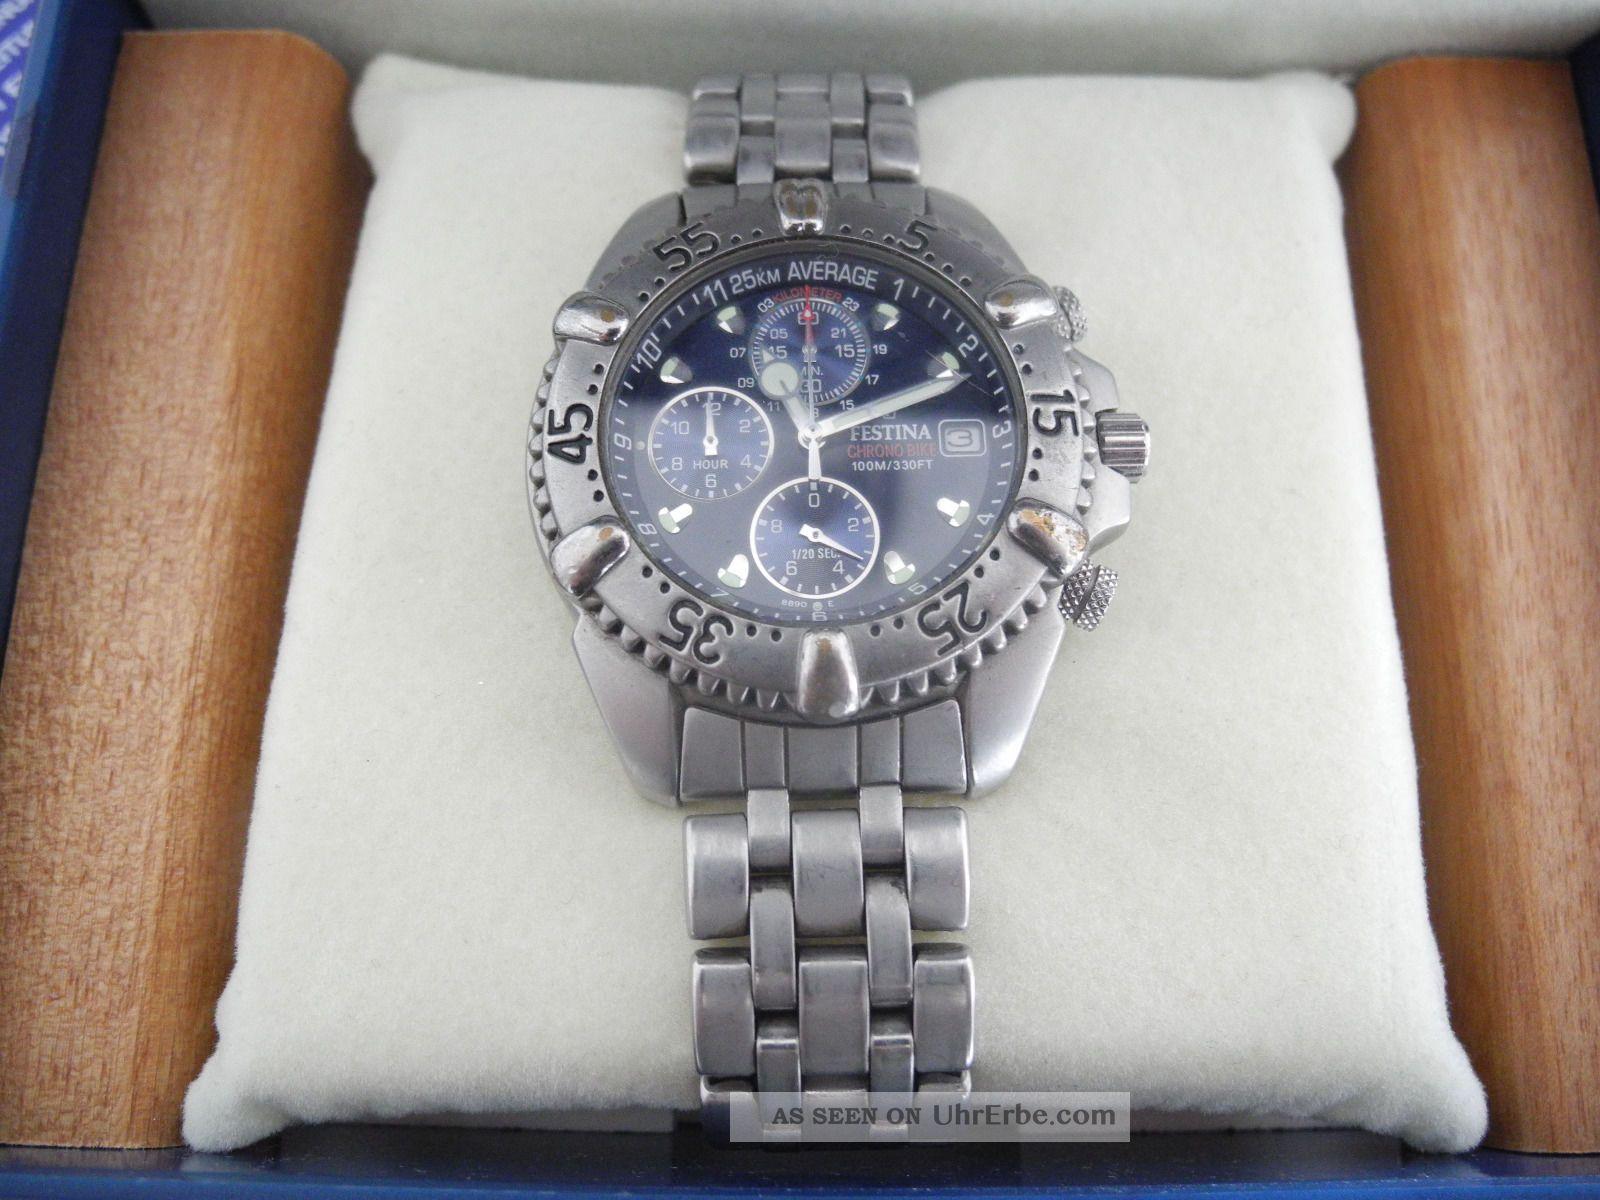 Festina Uhr Chronograph Armbanduhren Bild